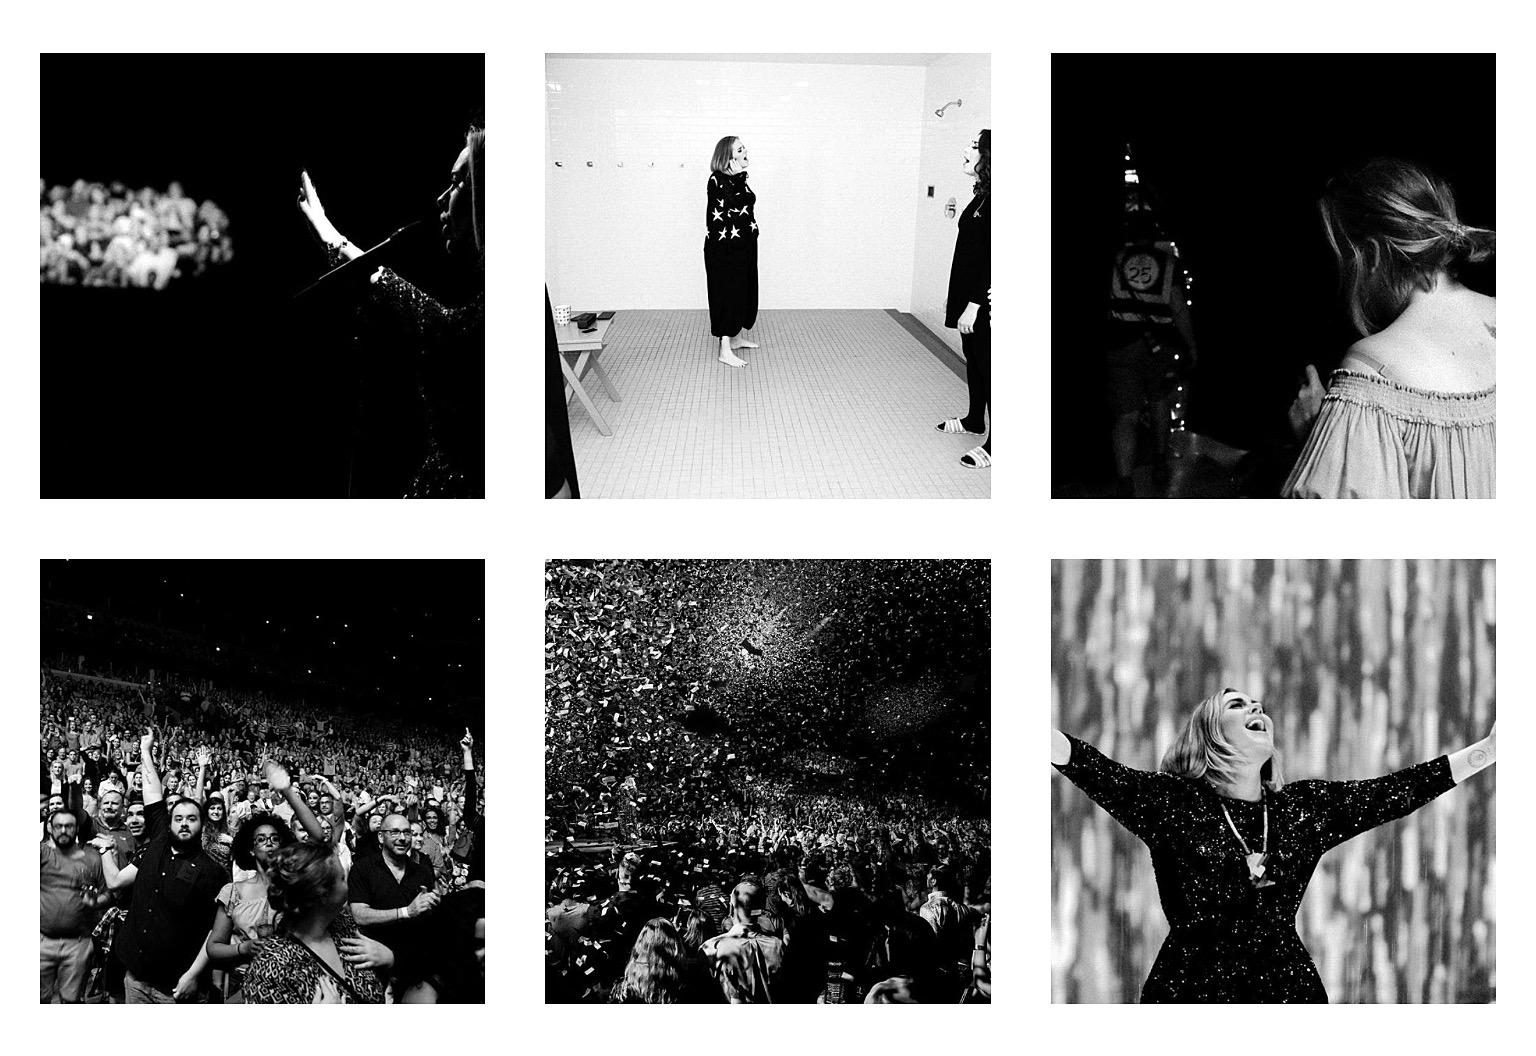 https://www.instagram.com/adele/